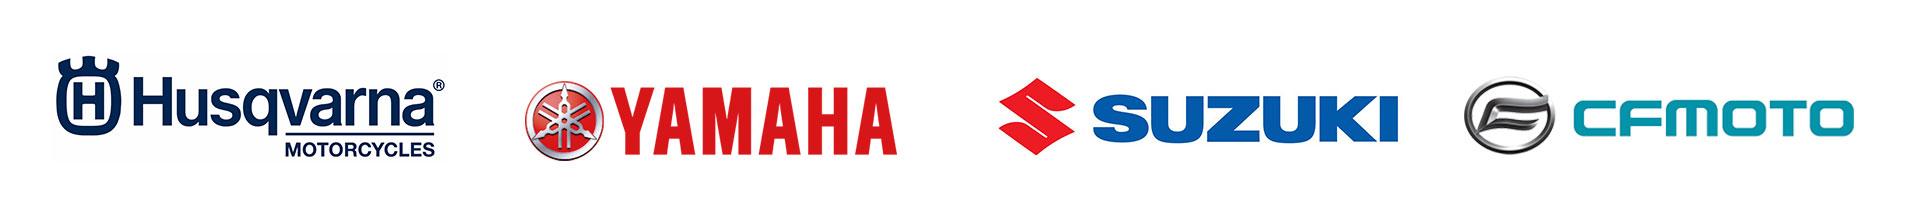 Yamaha and Husqvarna Motorcycle Dealers UK